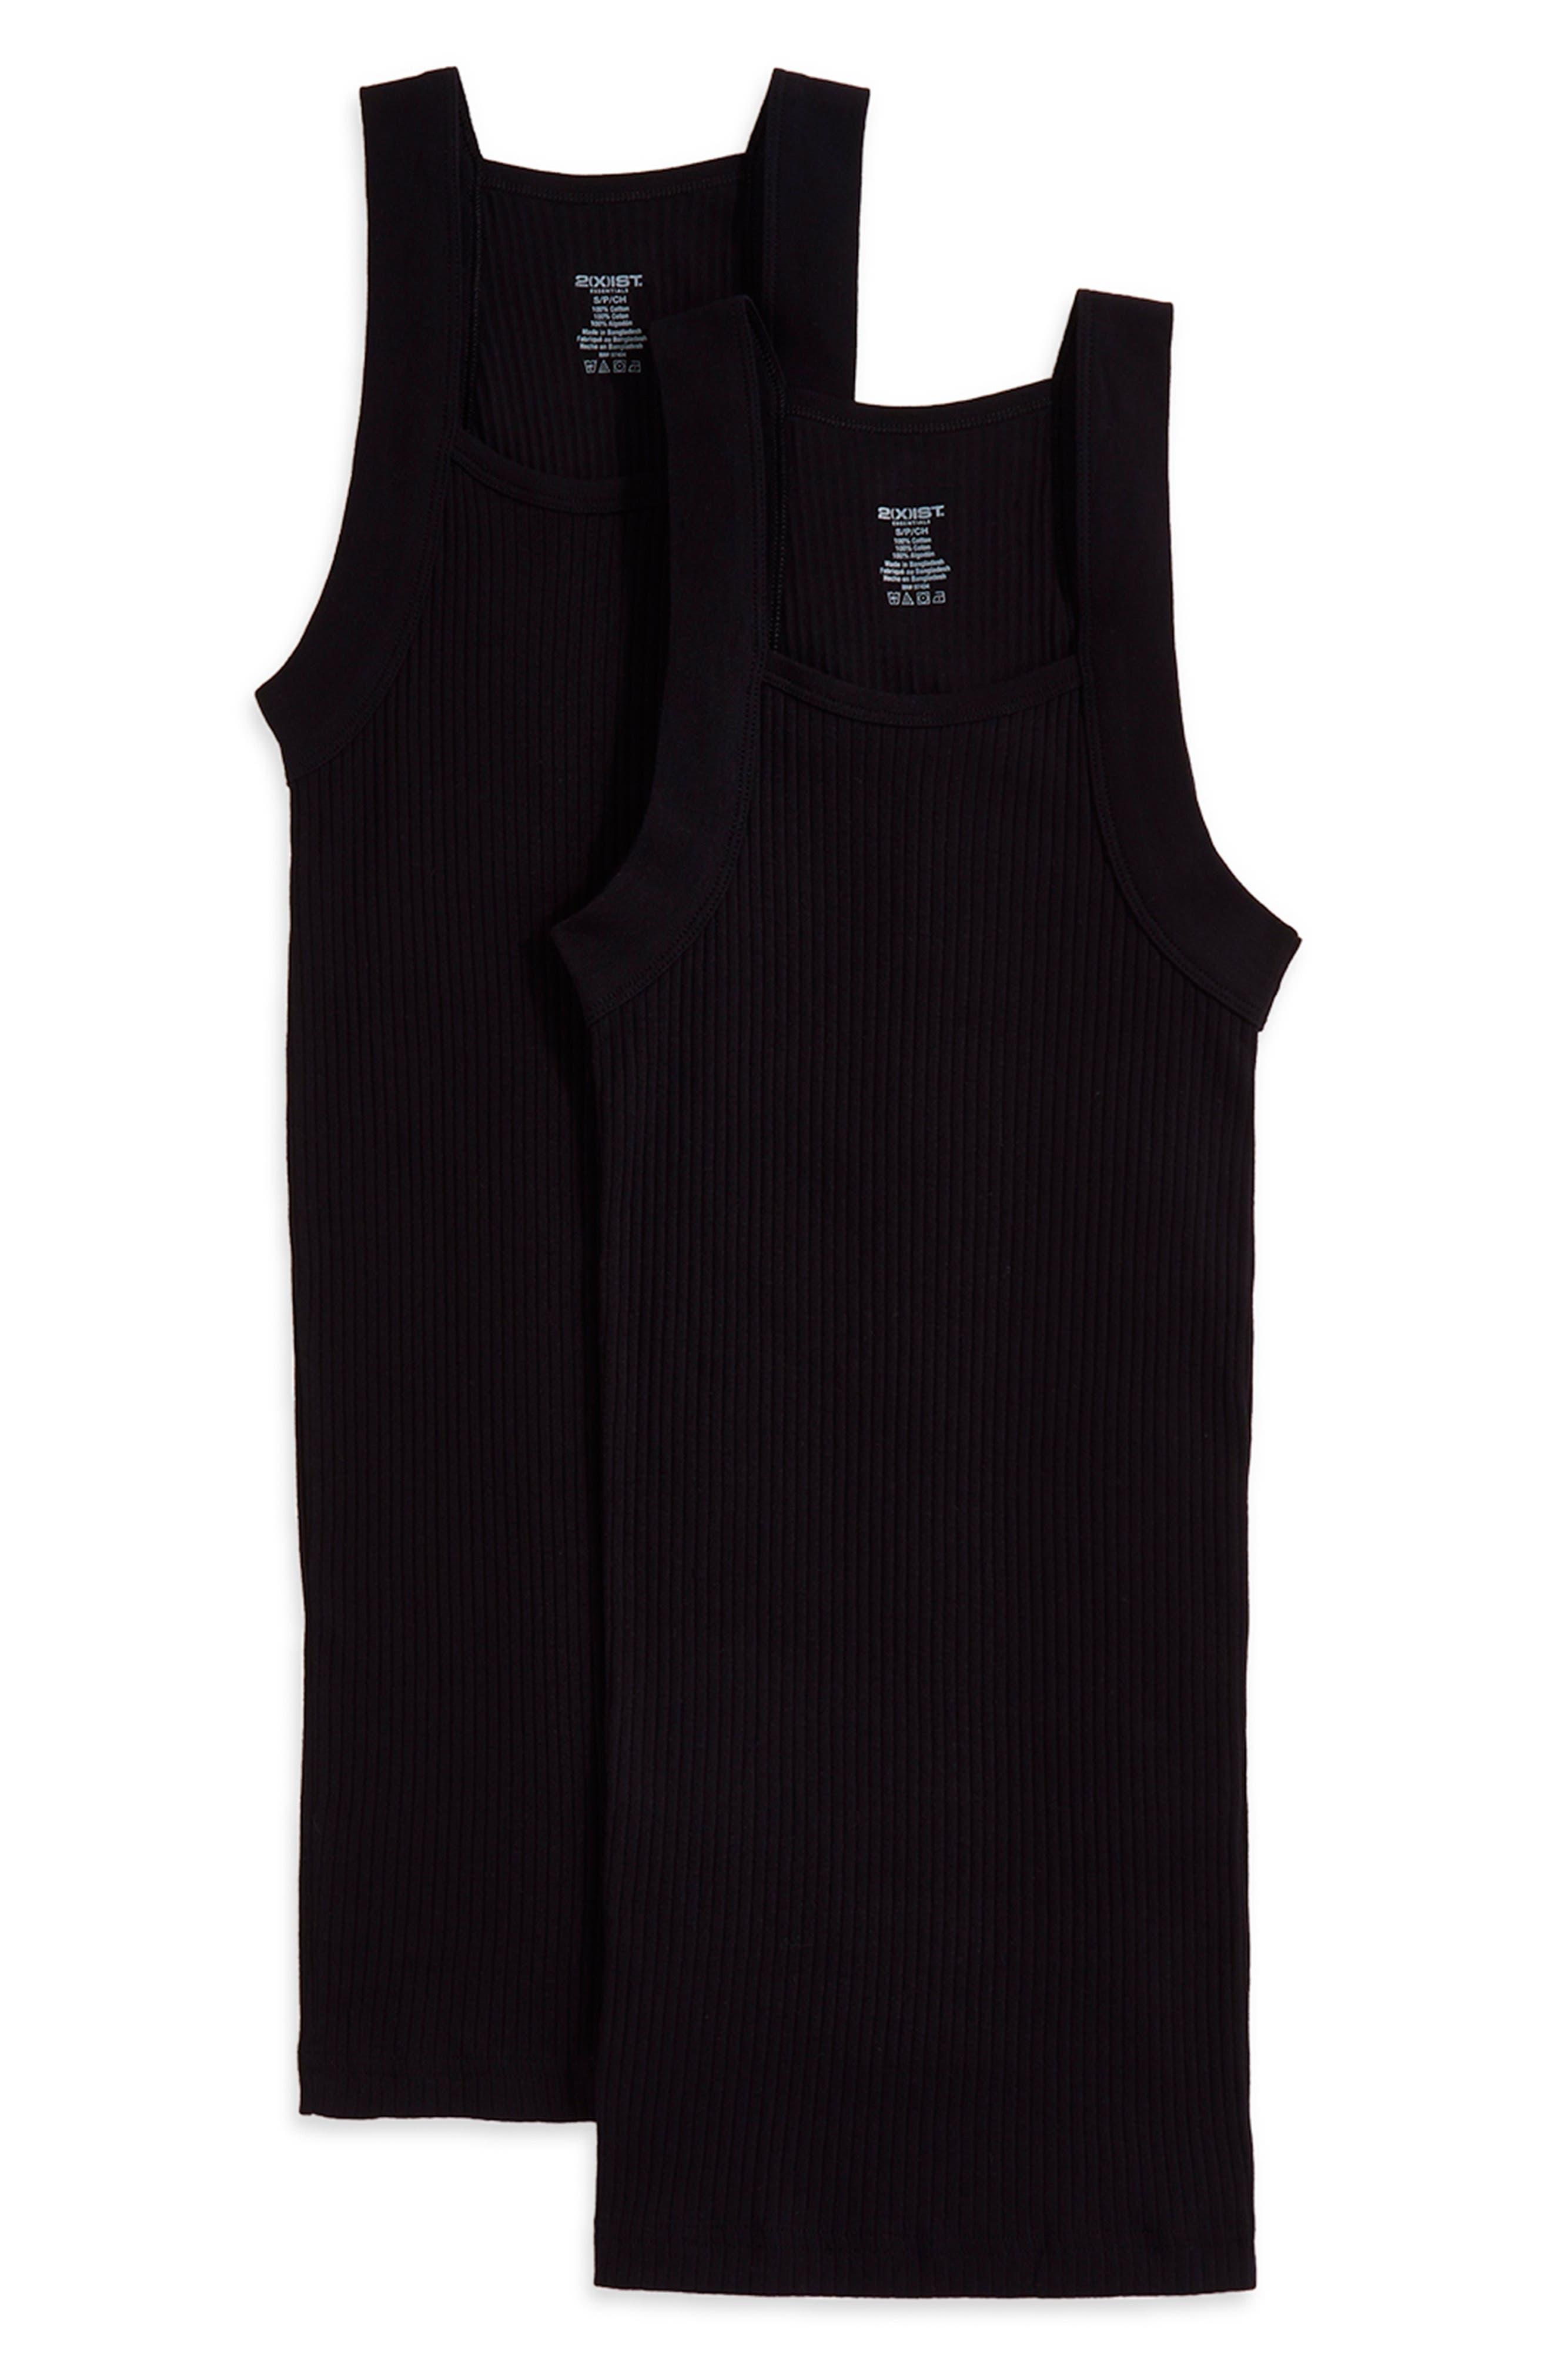 2-Pack Cotton Tank Top,                         Main,                         color, BLACK NEW LOGO